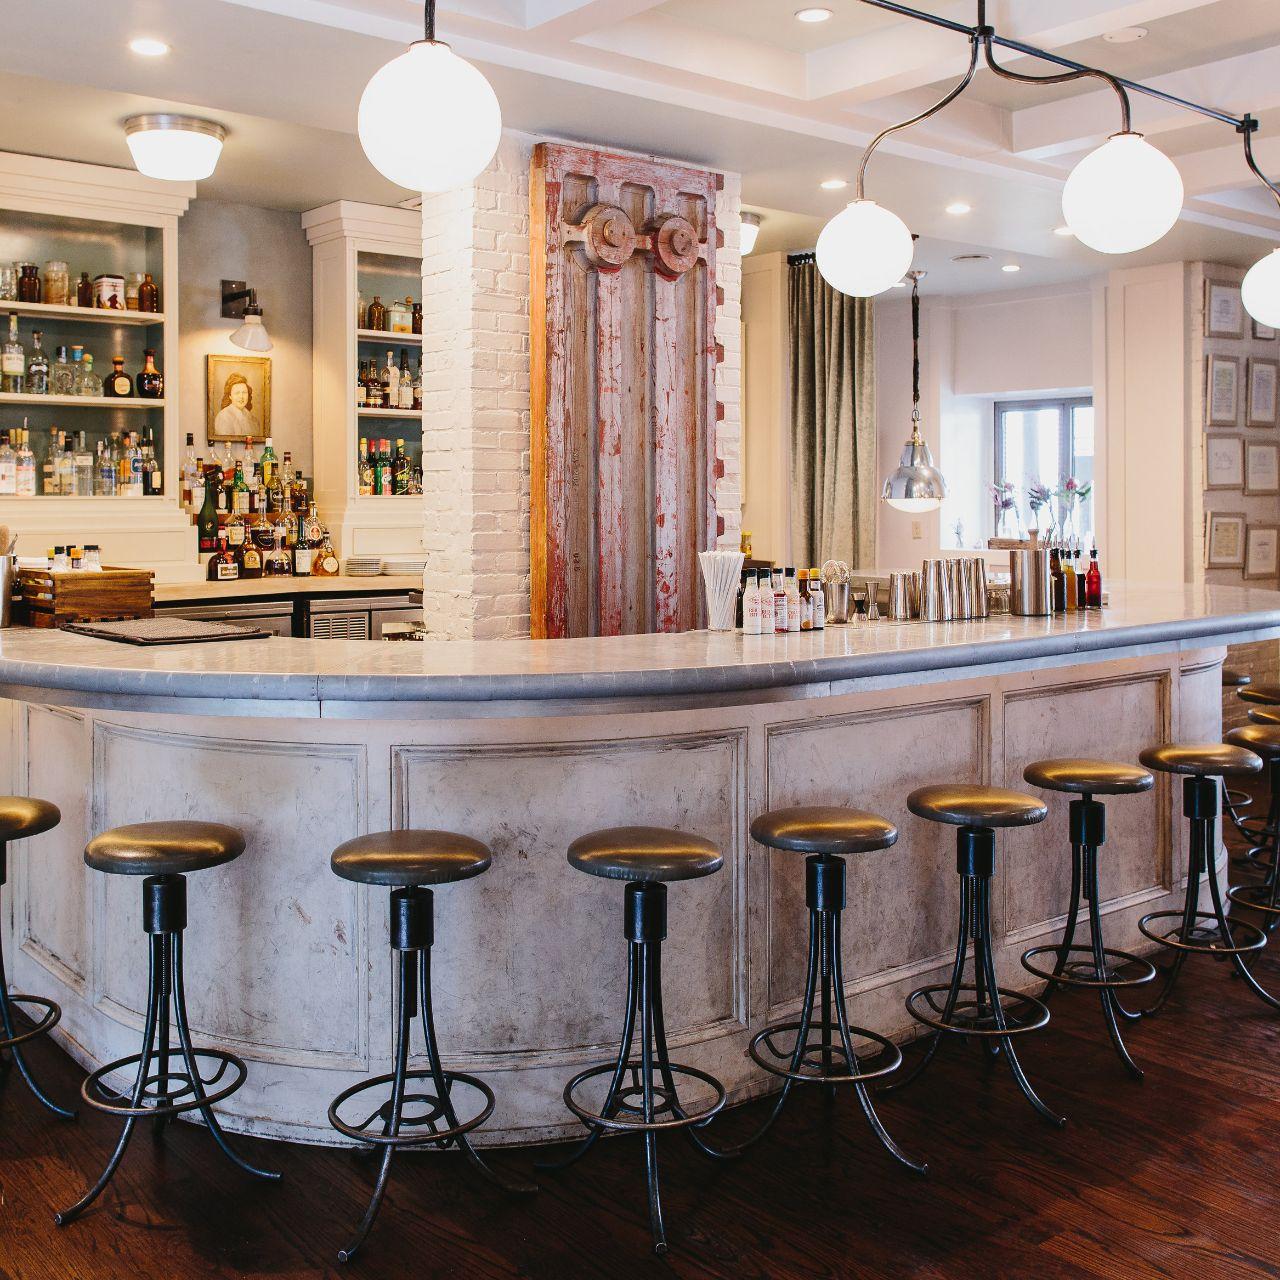 Jct Kitchen And Bar Restaurant Atlanta Ga Opentable